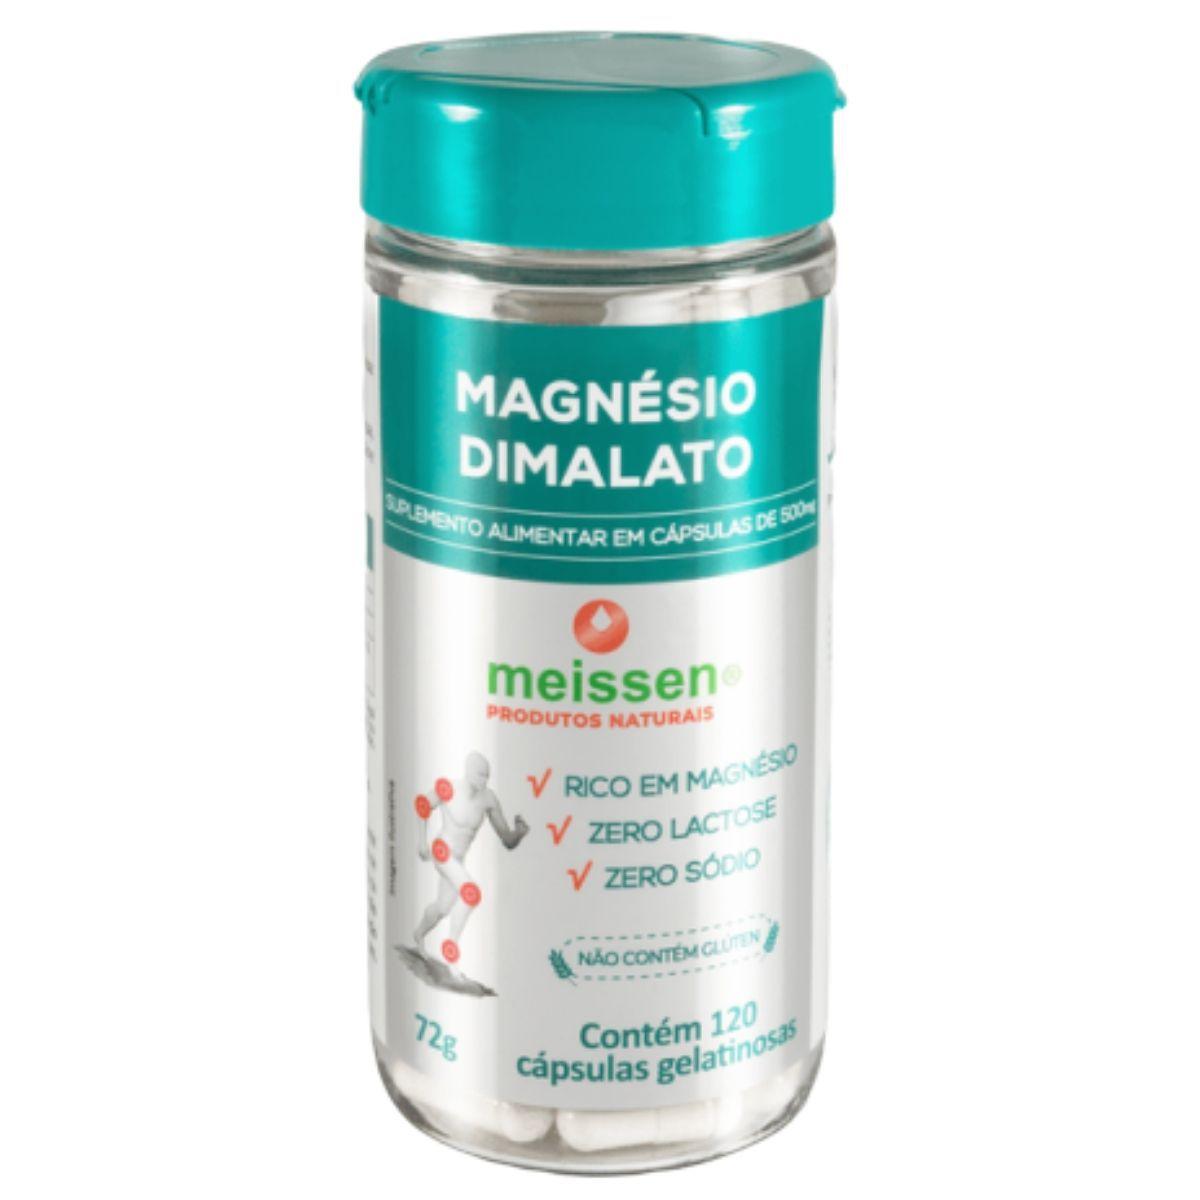 Magnésio Dimalato Puro  120 Cápsulas Gelatina Meissen